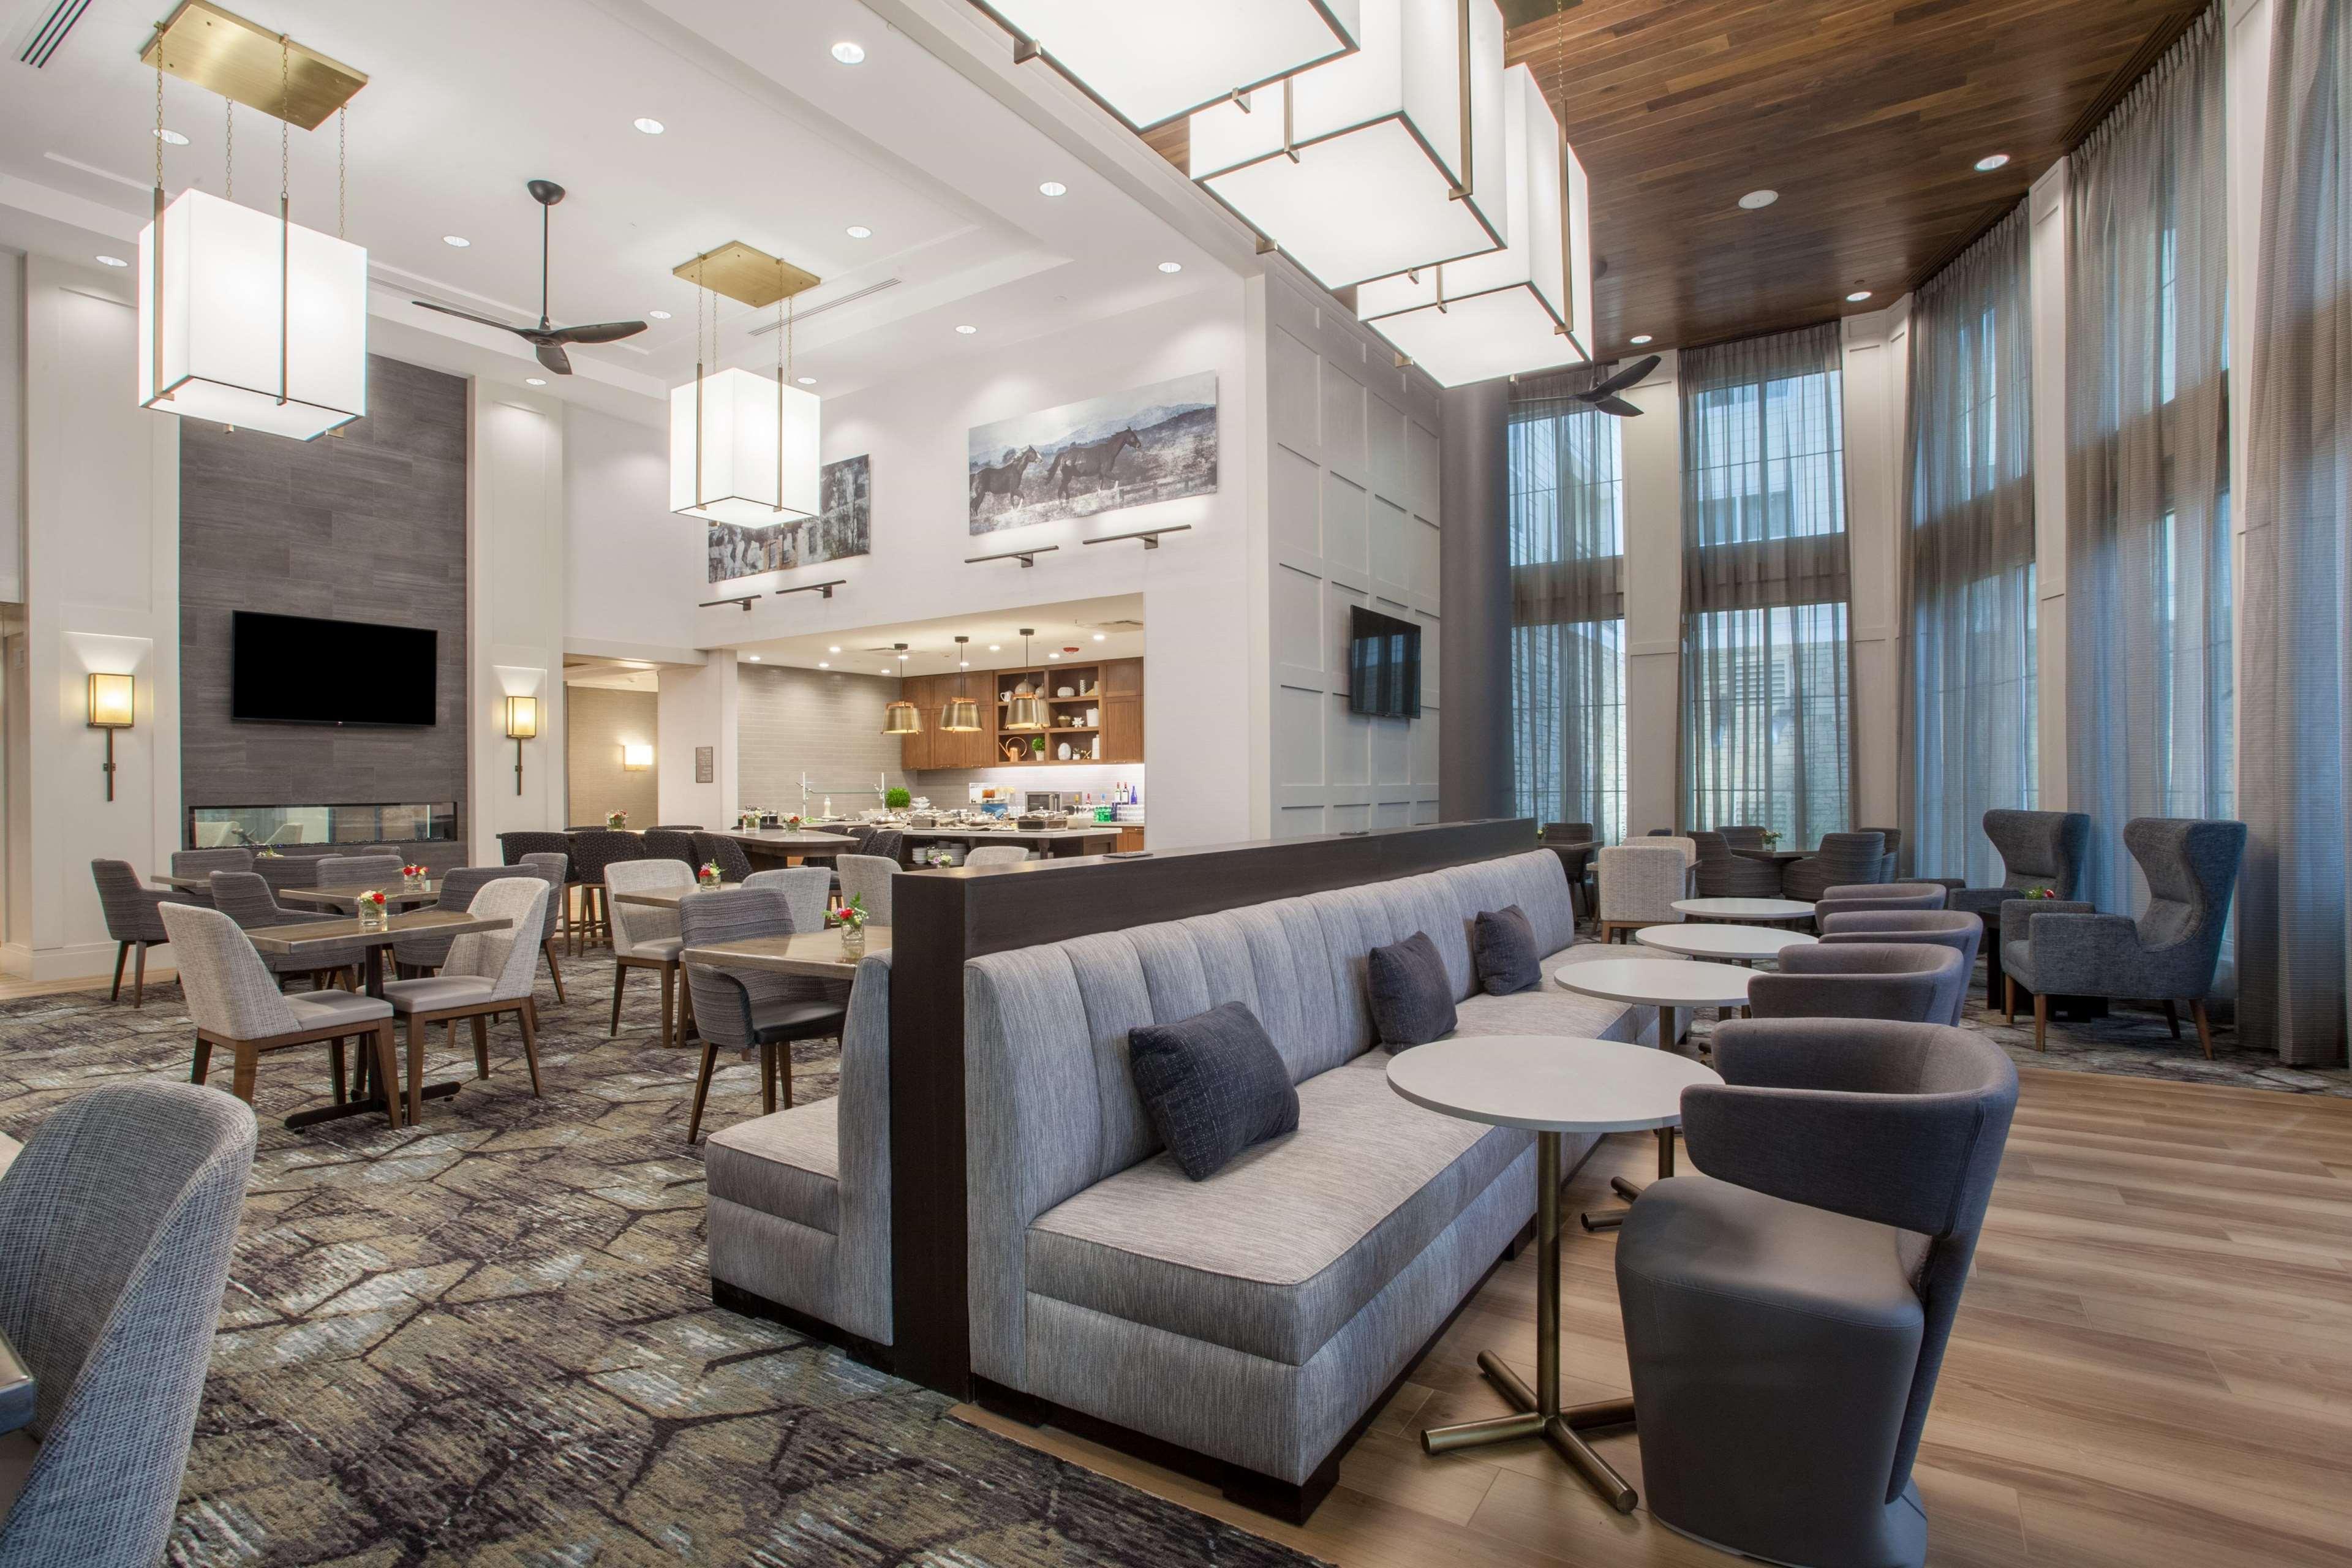 Homewood Suites by Hilton Saratoga Springs image 43